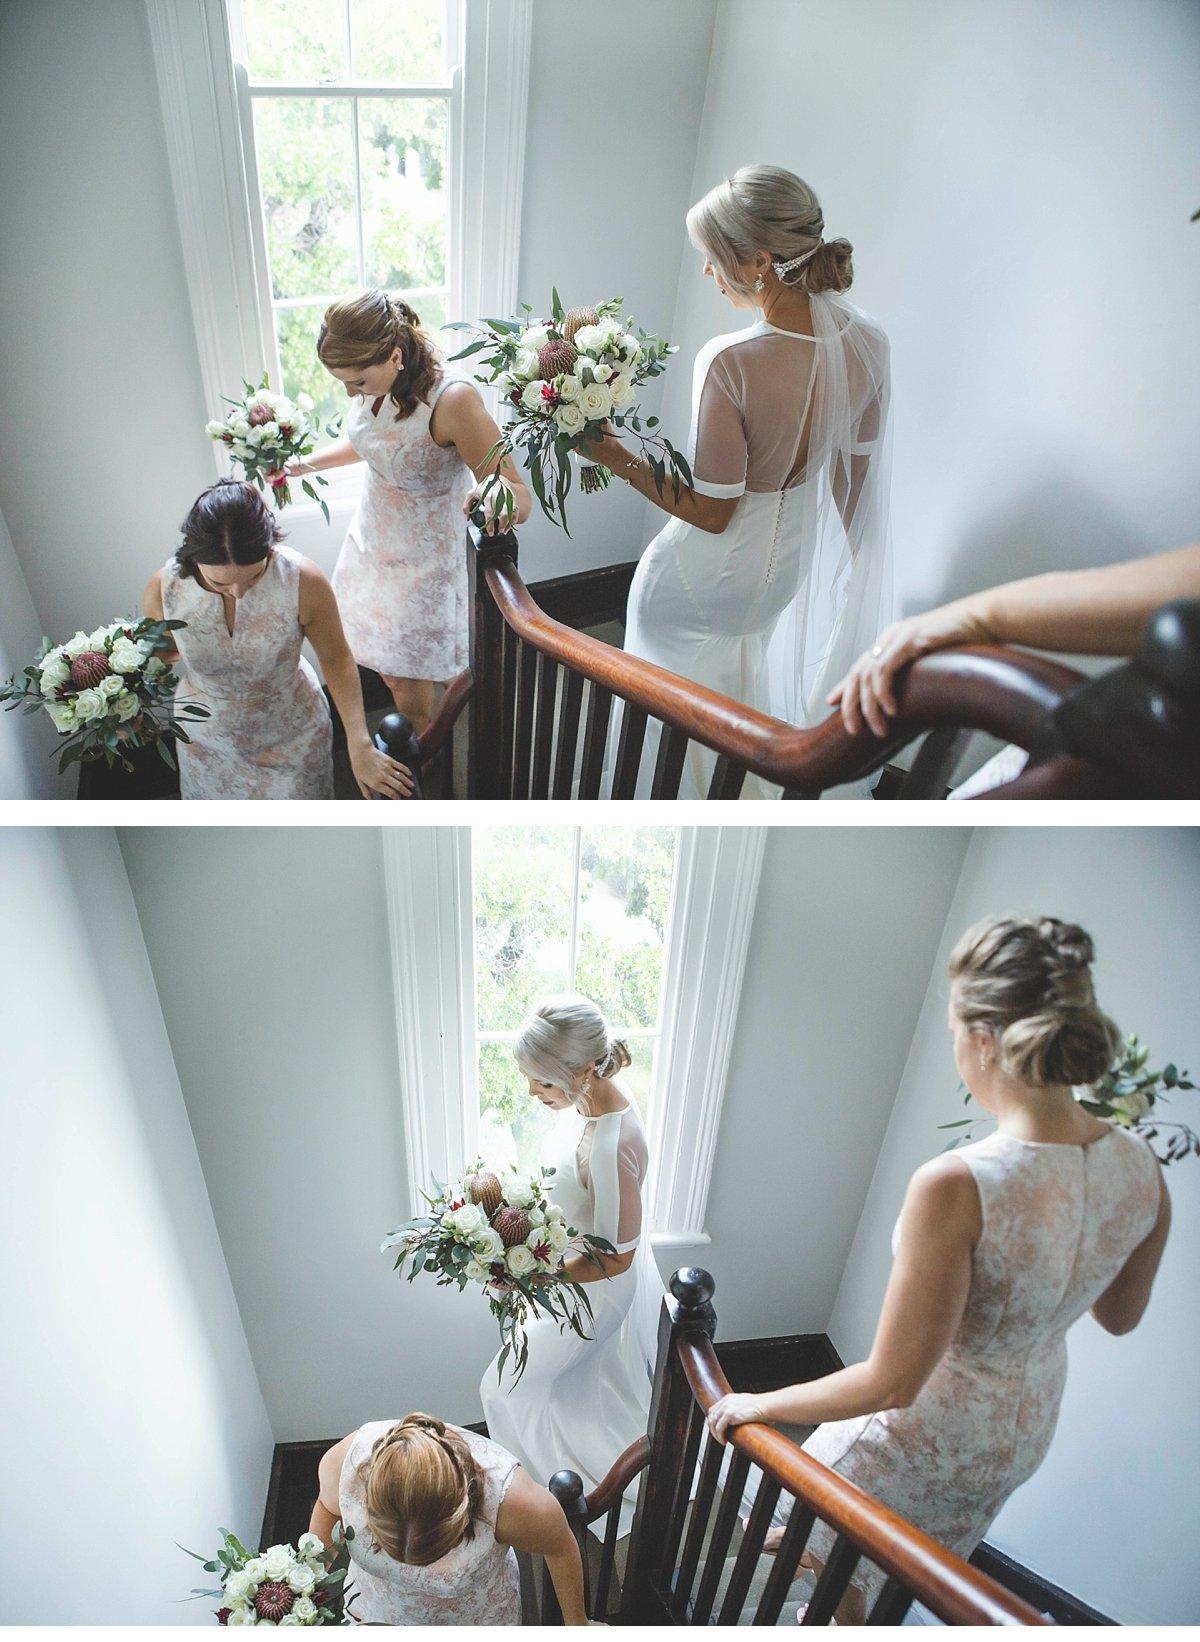 Burandana Hall wedding by Wagga Wagga Wedding Photographer Peppermint Studios_St Michaels Cathedral Wagga_Deniliquin weddings_0156